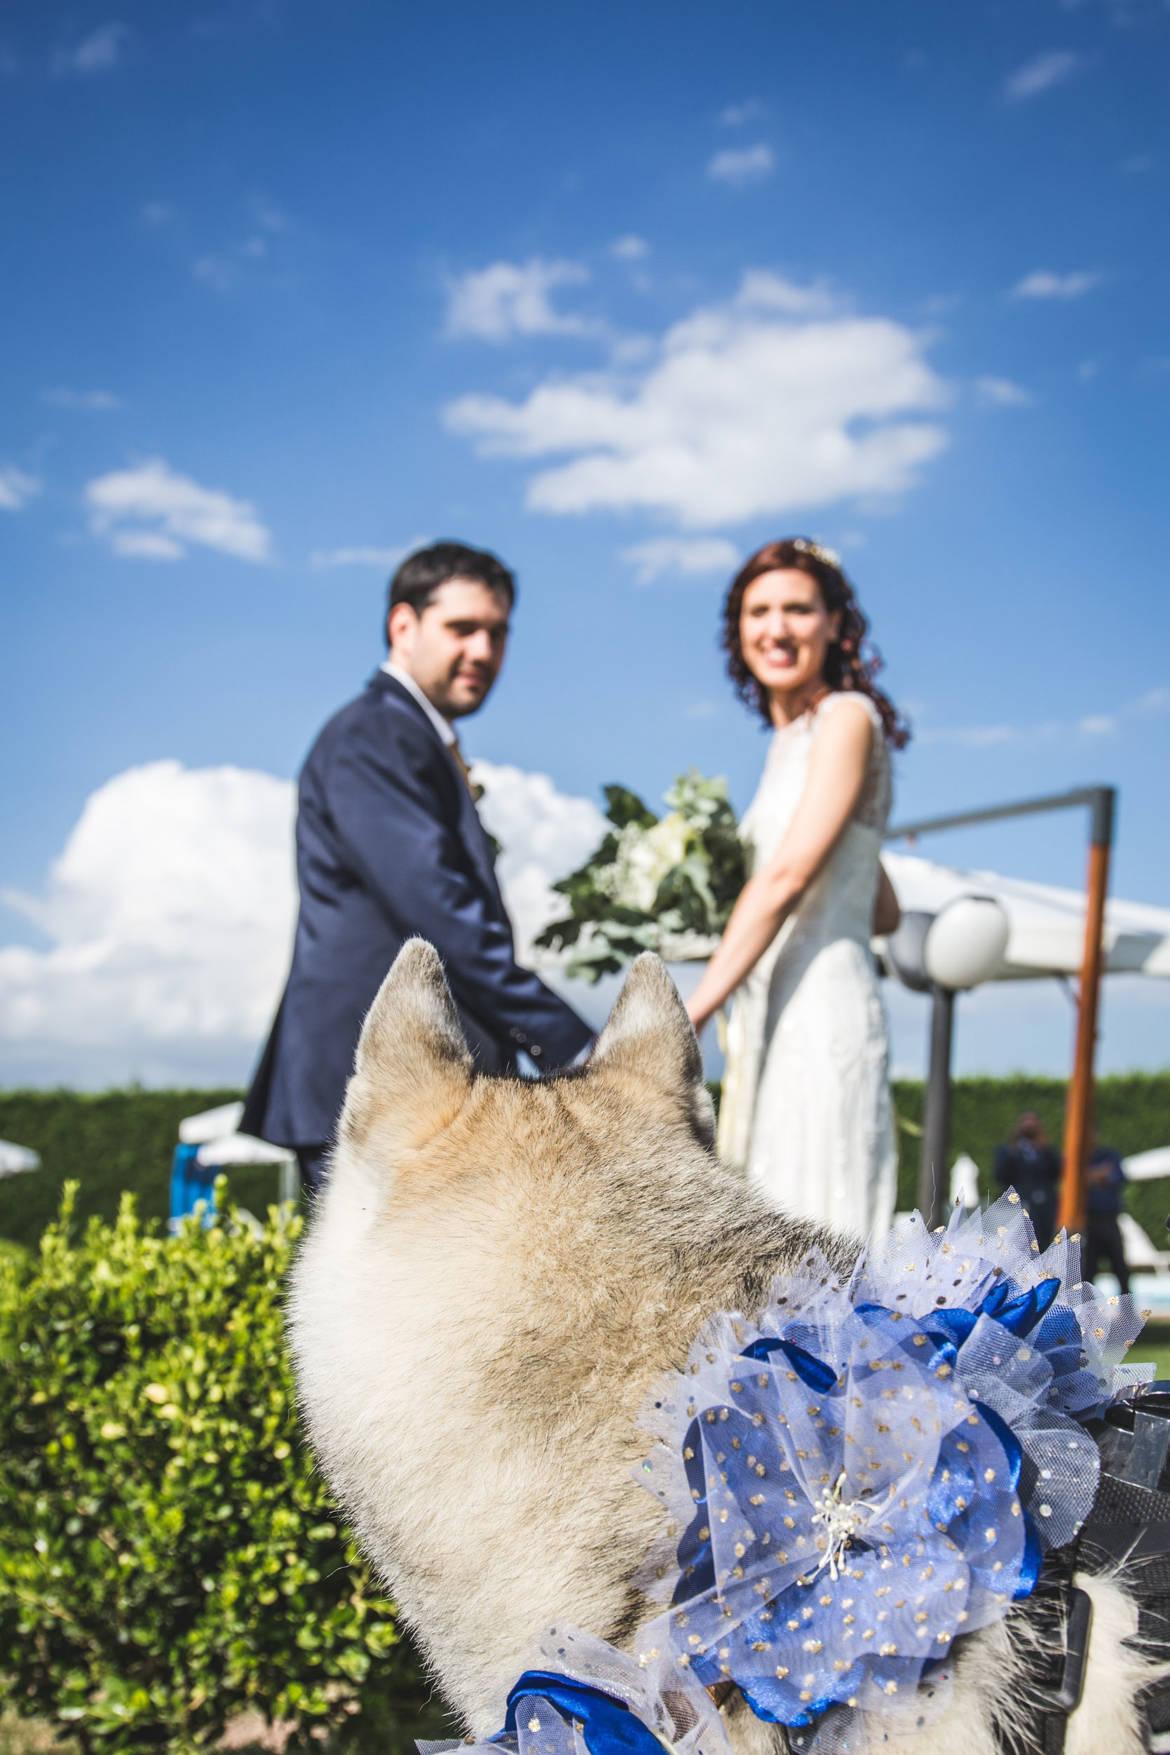 Matrimonio-Enrico-e-Mirna-16.jpg